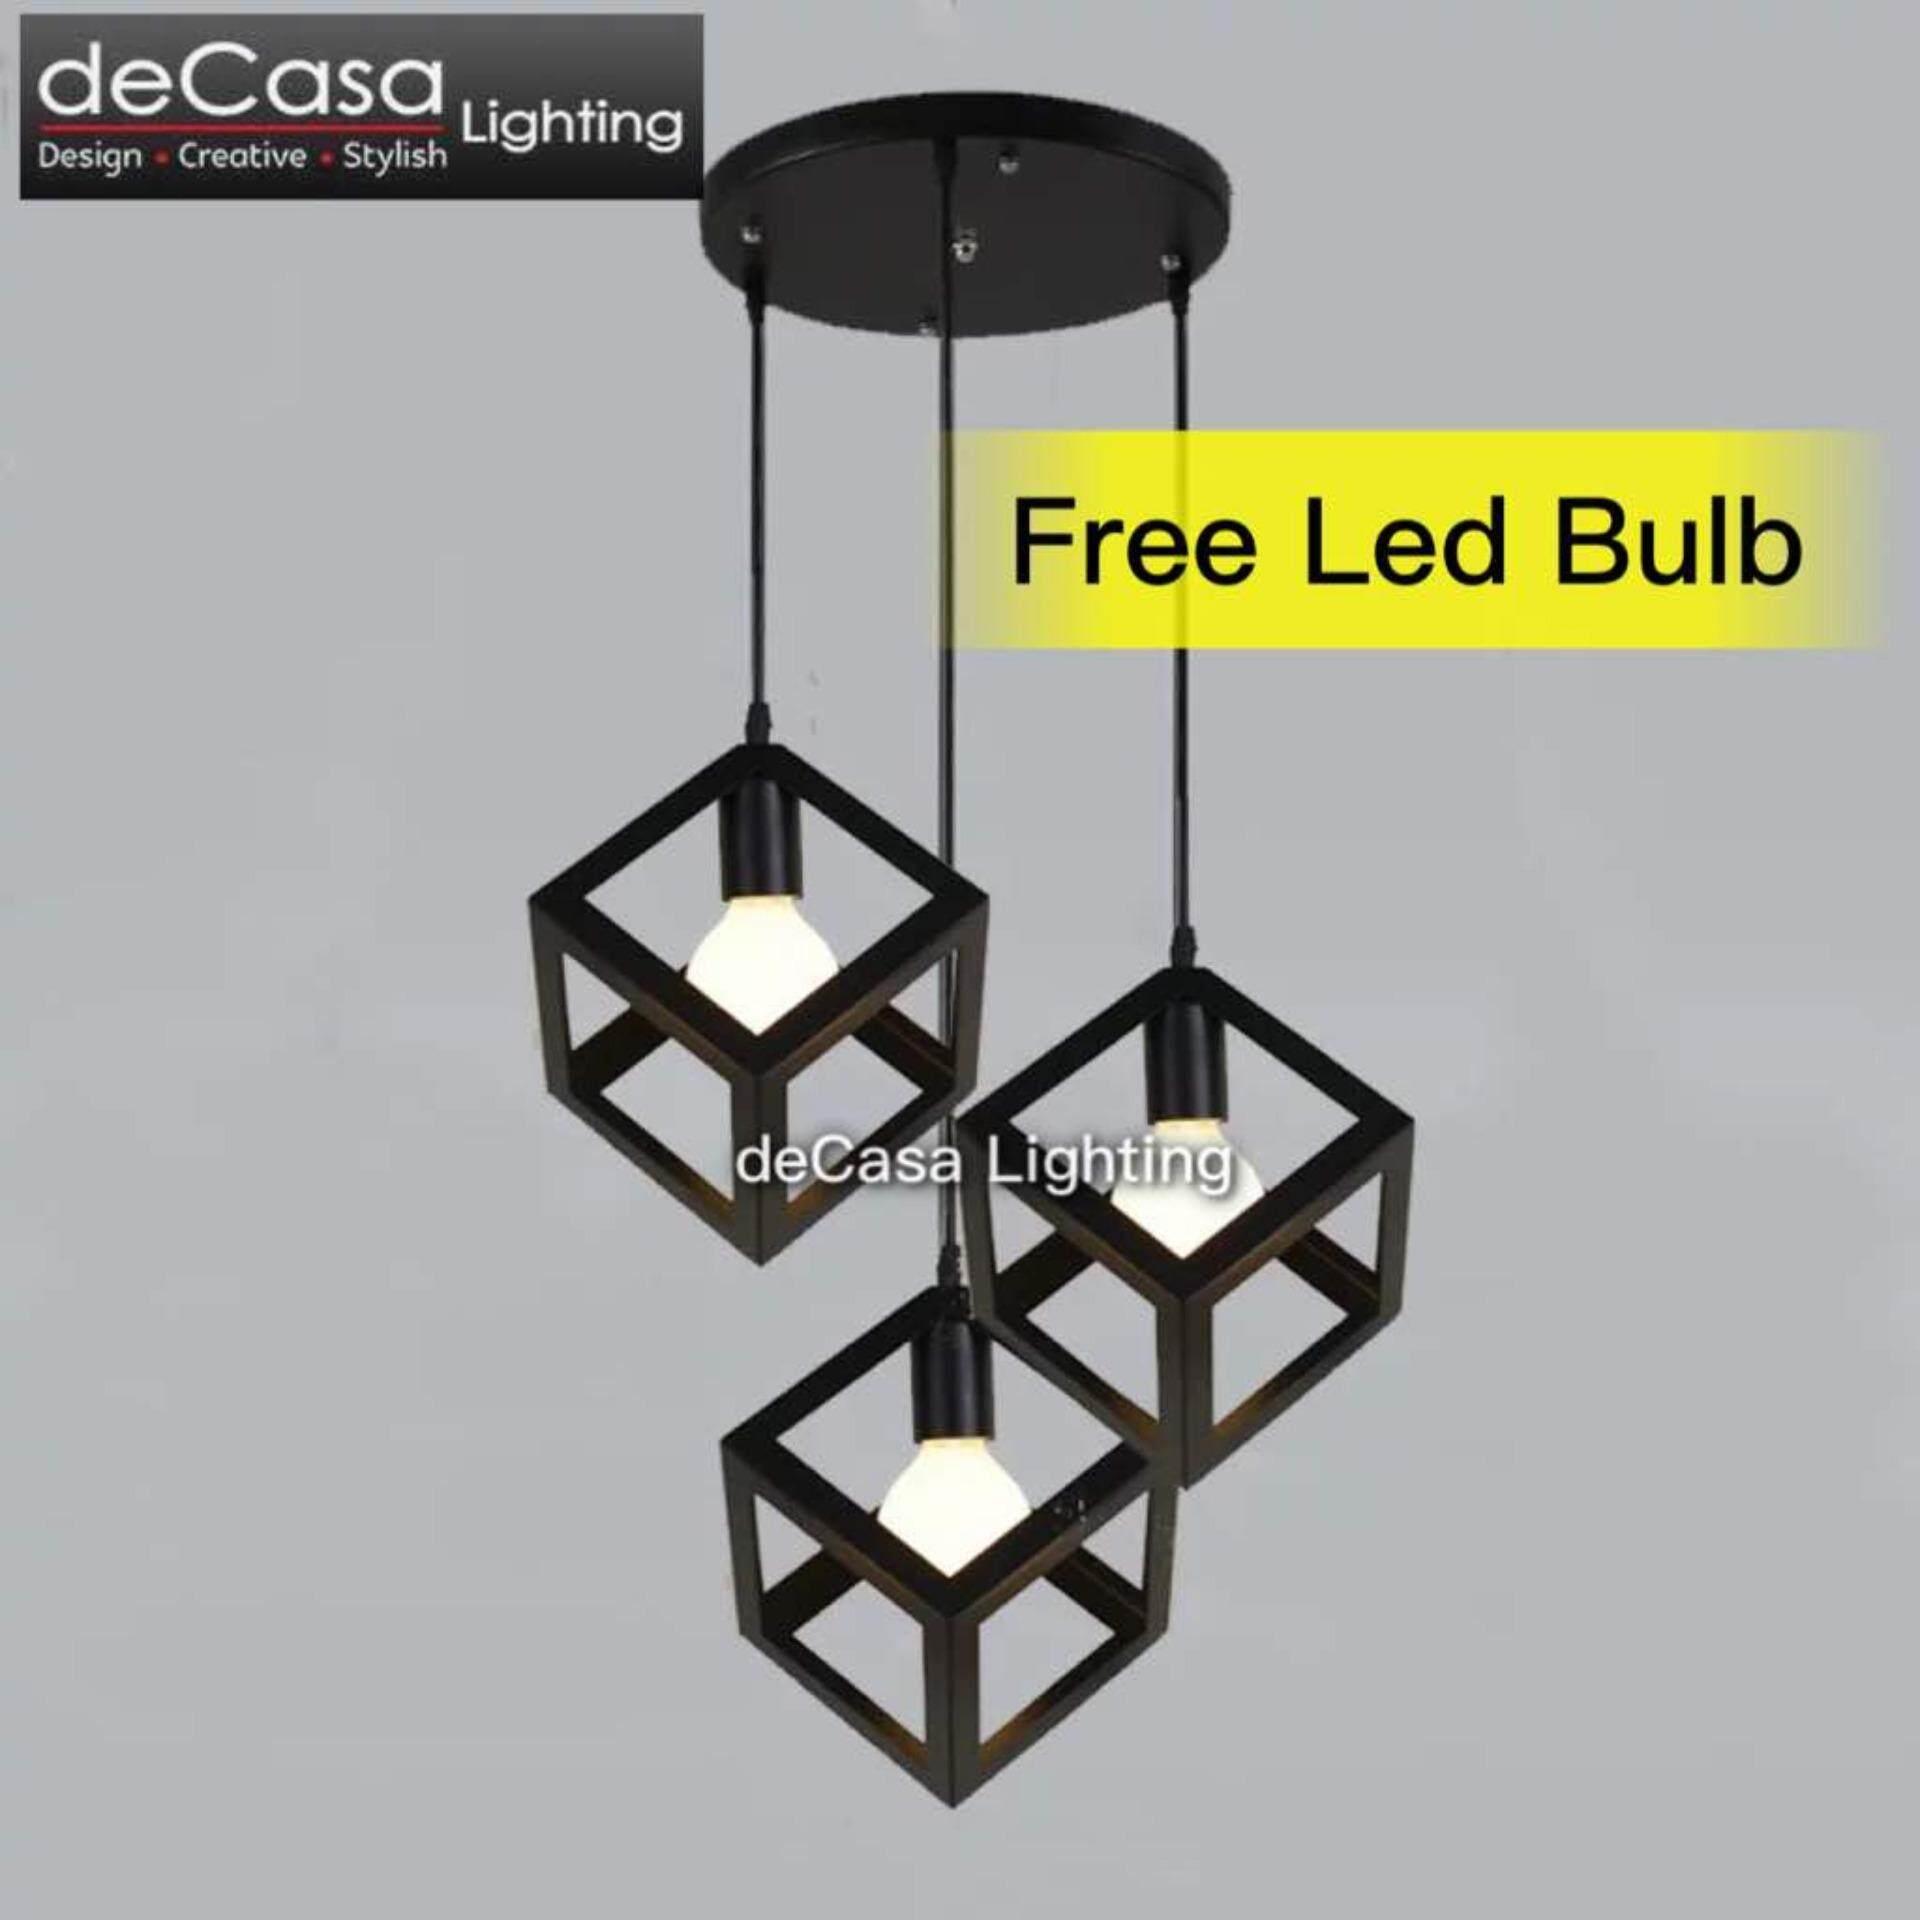 Scandinavian Loft Lamps Lighting home led steel deco dinner lights spot art room deco kitchen id